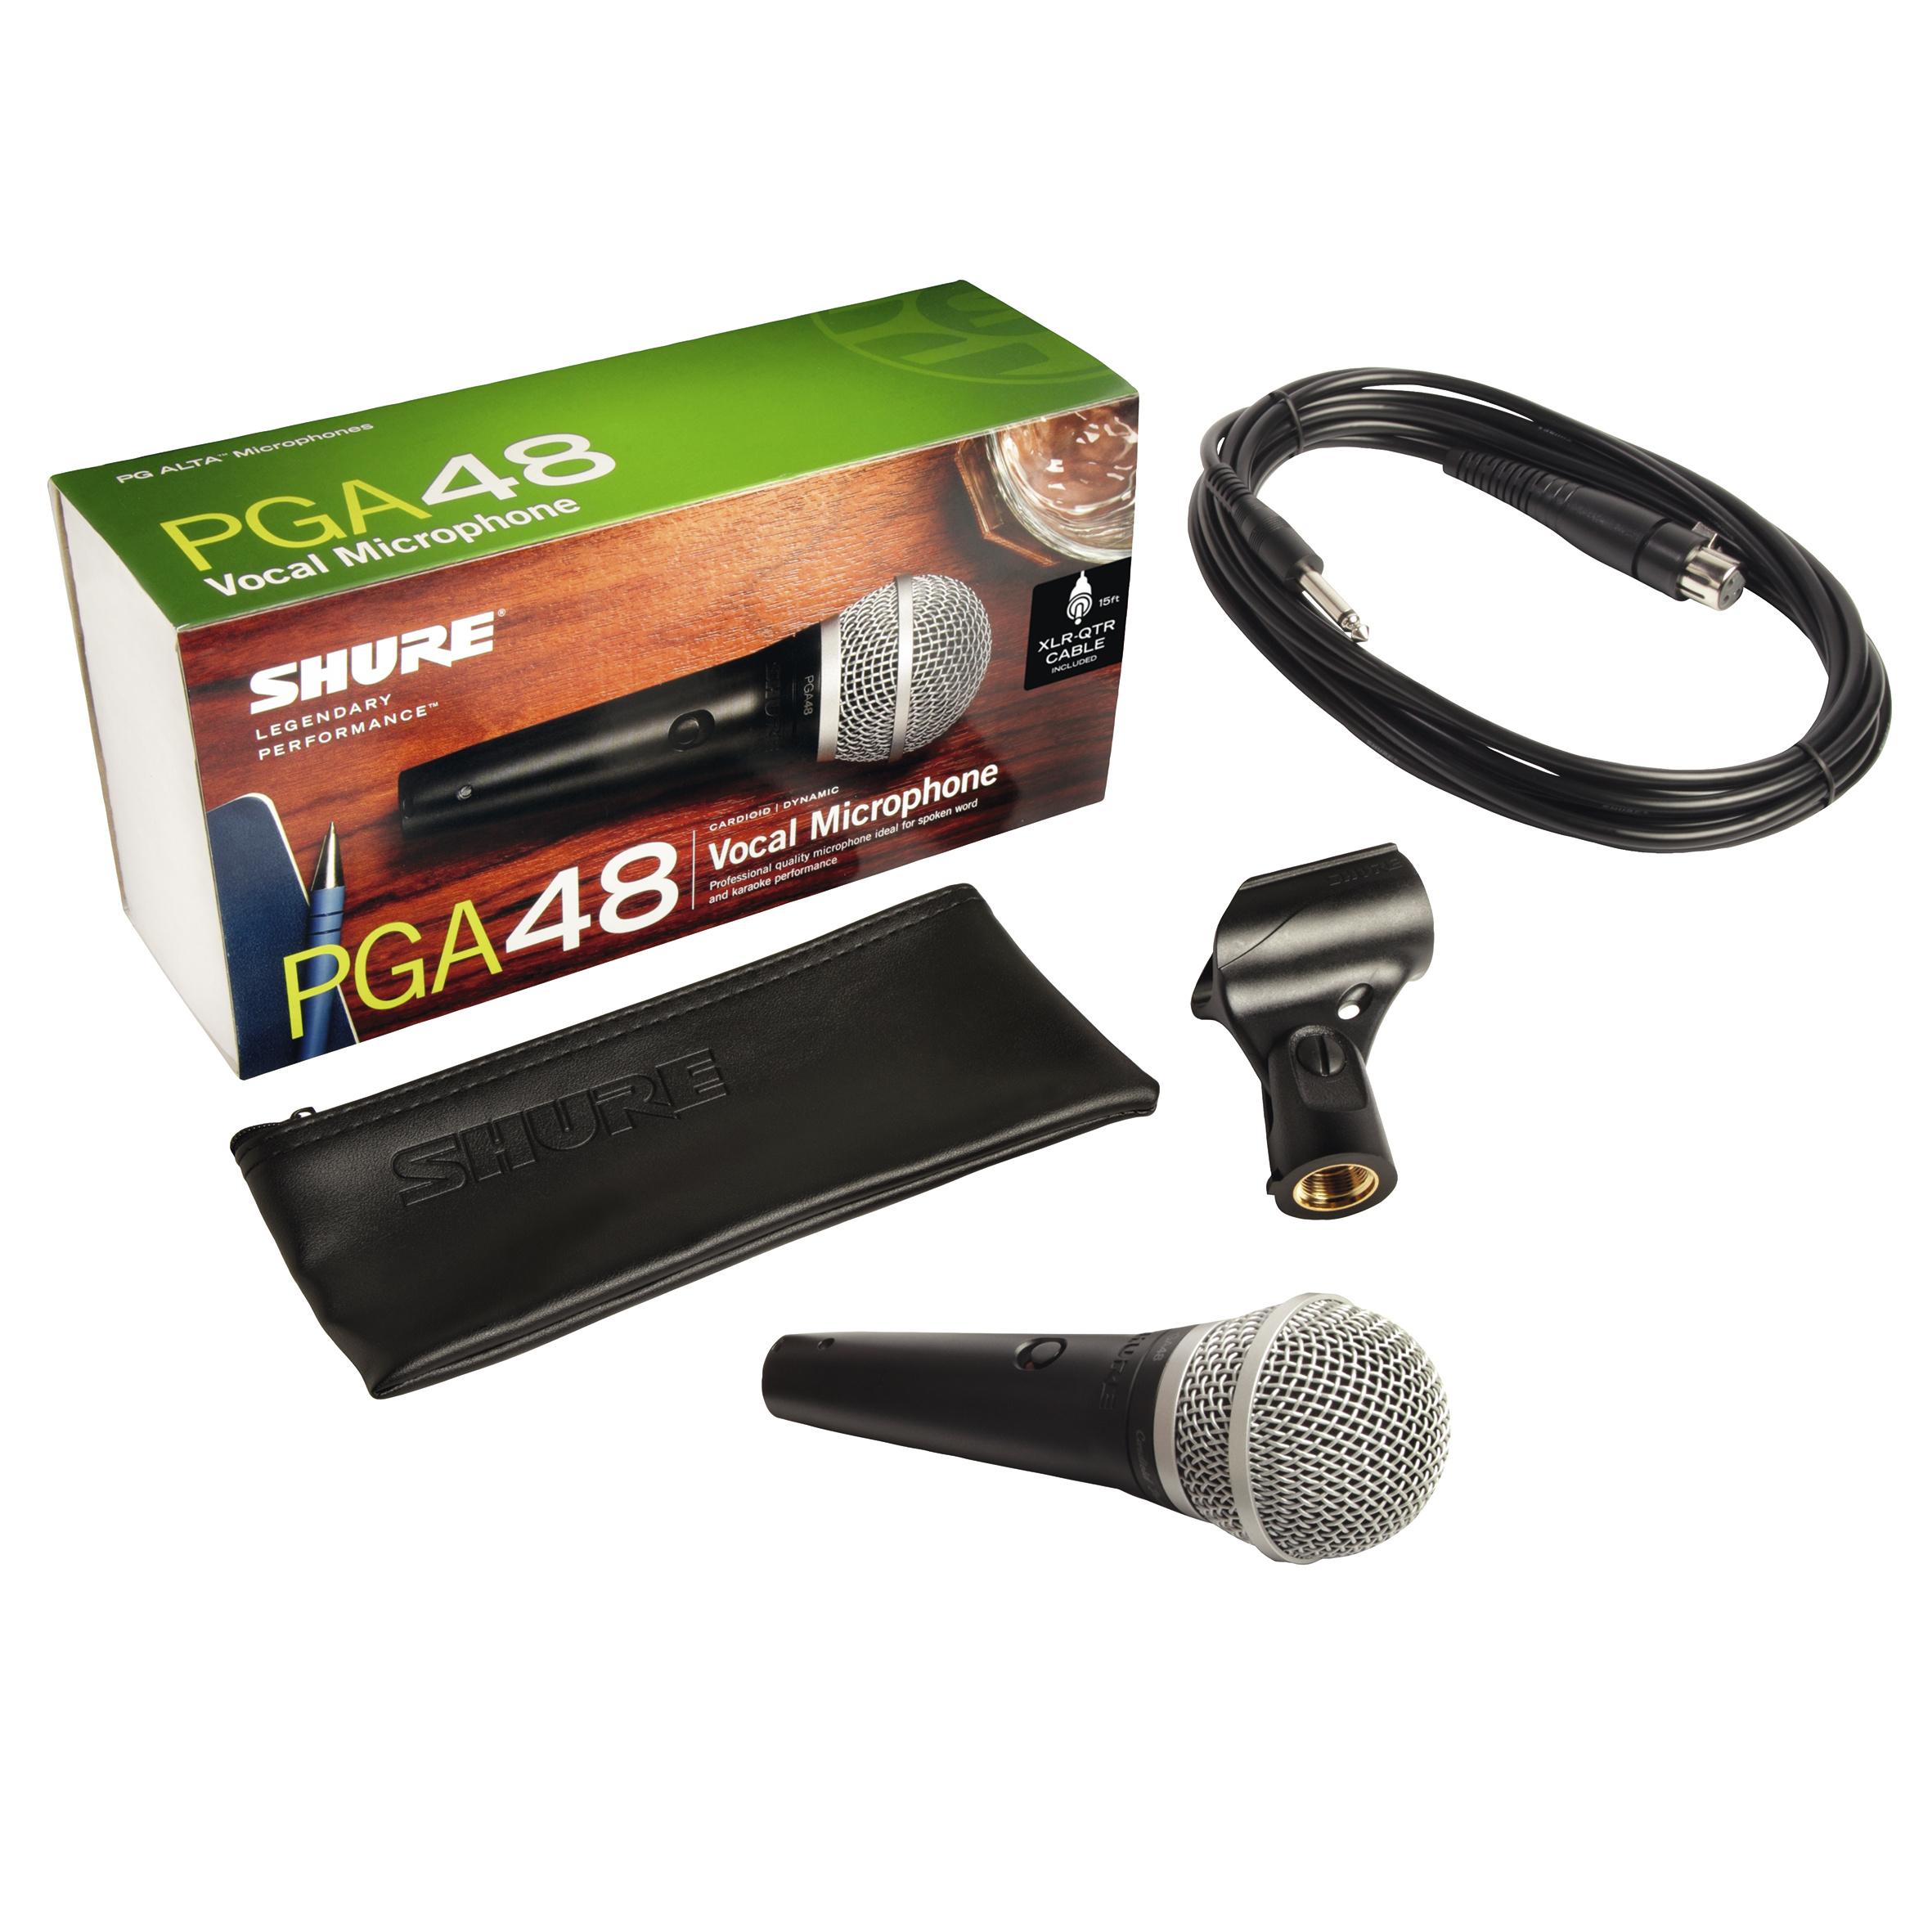 Shure PGA 48 QTR inkl. XLR-Klinke-Kabel 235408